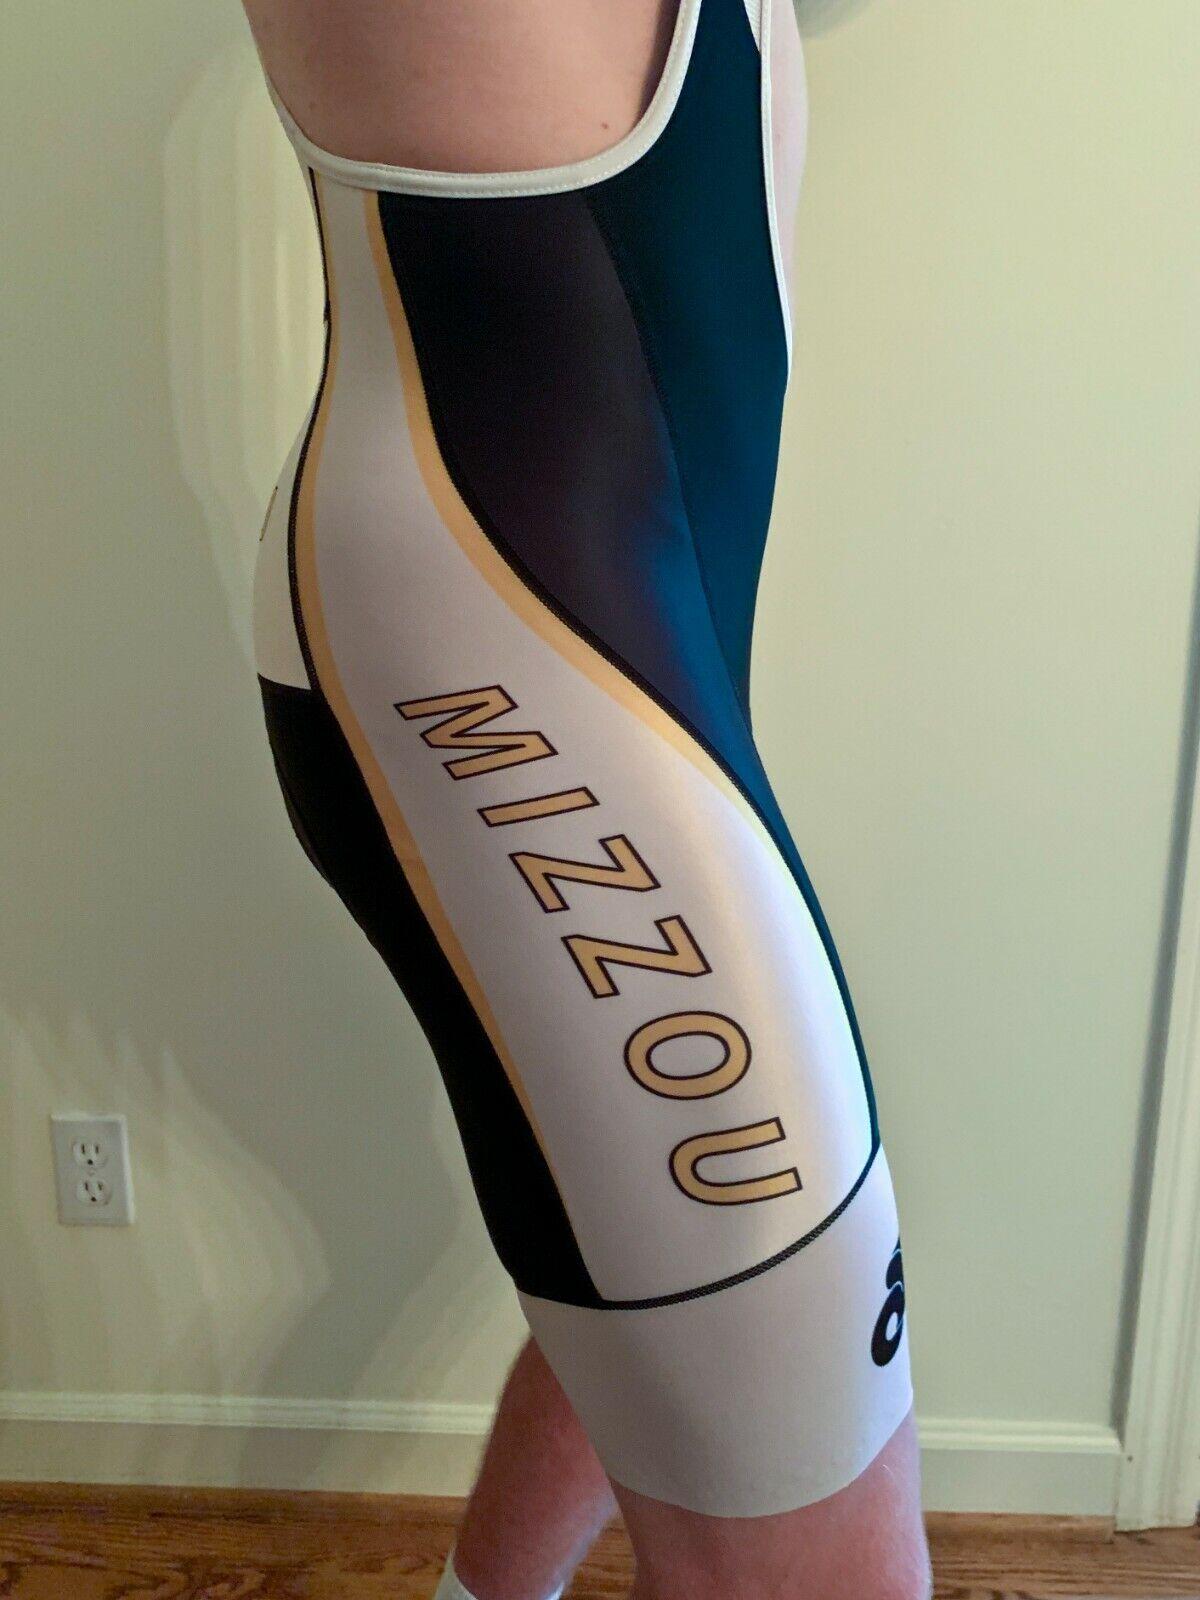 University of Missouri Mizzou Champsys Bib  Cycling Short Men's Small NWT  large selection